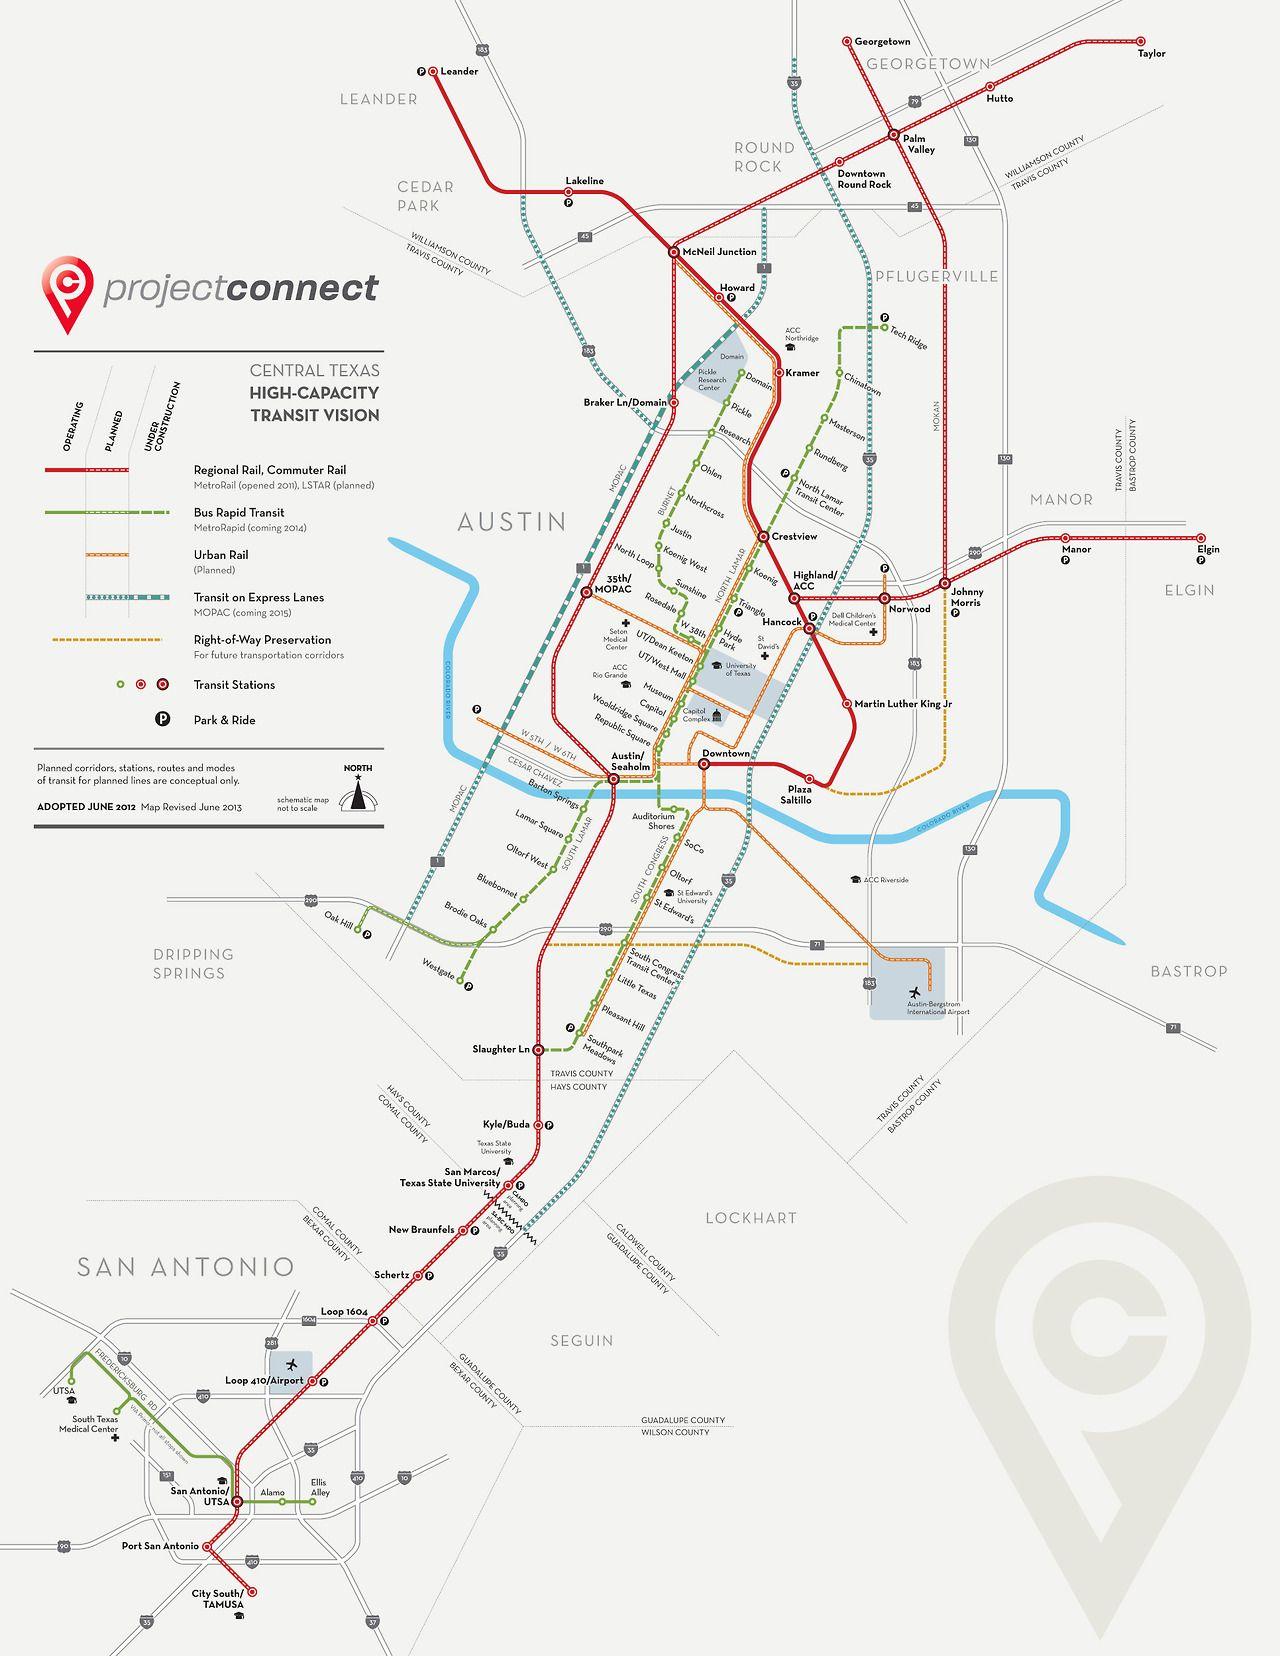 Austin Texas Subway Map.Pin By Oleg Zhuravlev On Graphic Map Map Diagram Bus Map